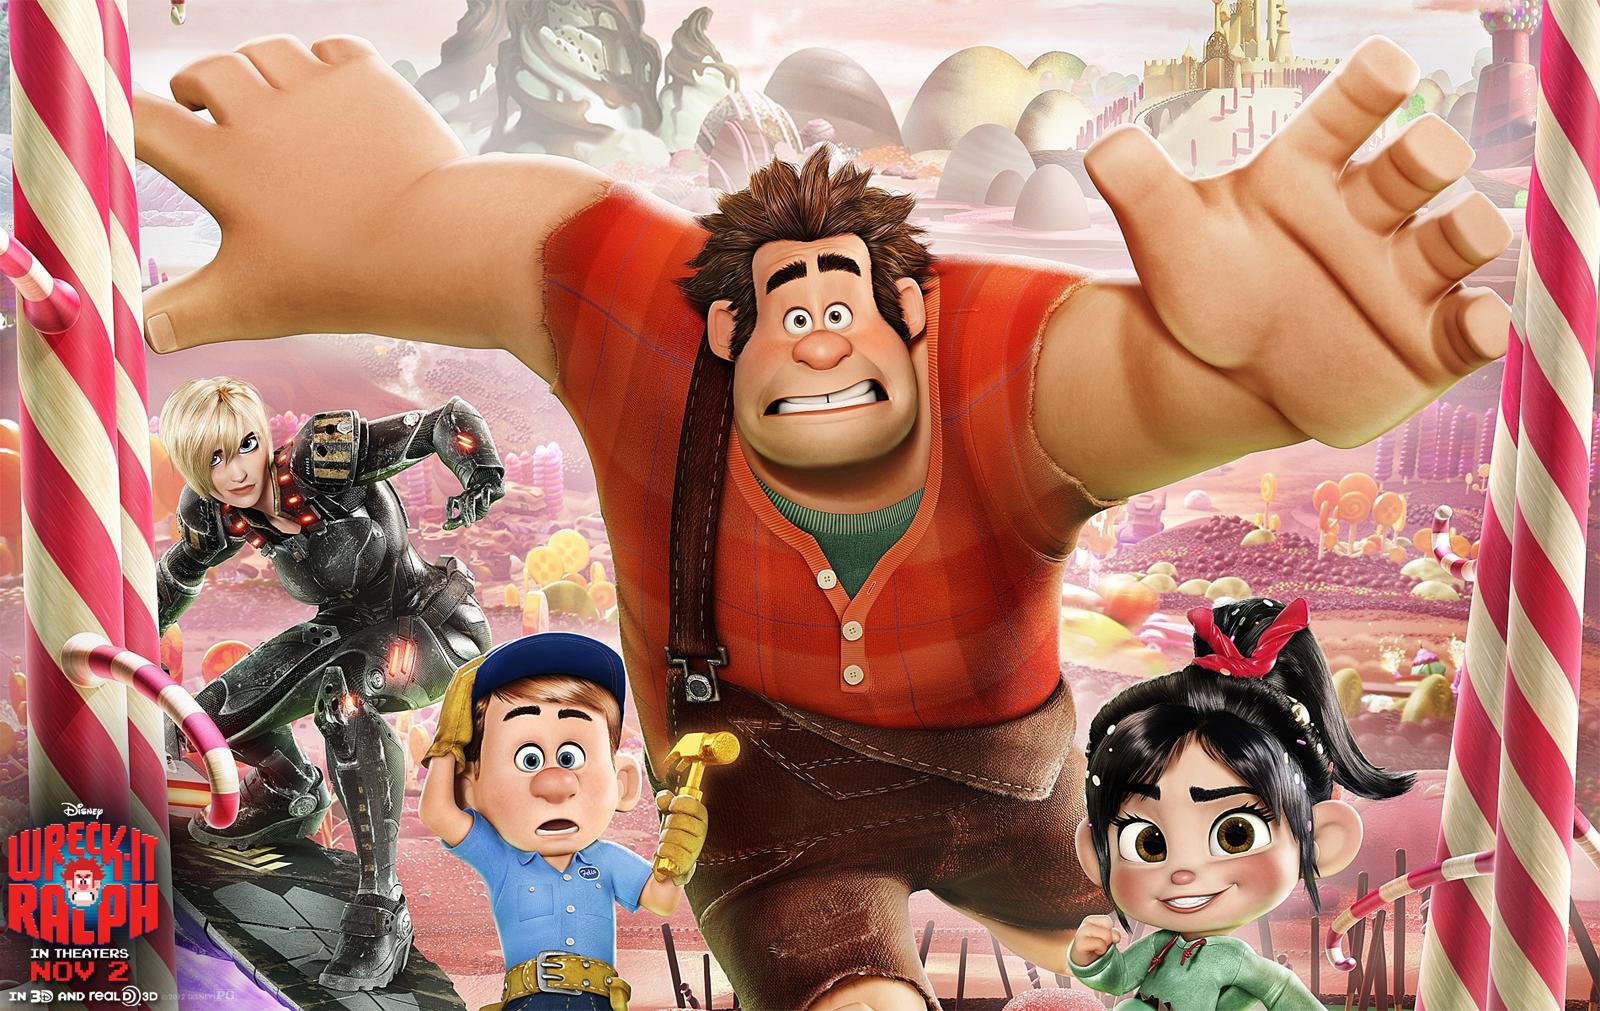 Wreck It Ralph Animation Movie 4k Hd Desktop Wallpaper For: Disney Wreck It Ralph 3D Animation HD Wallpapers